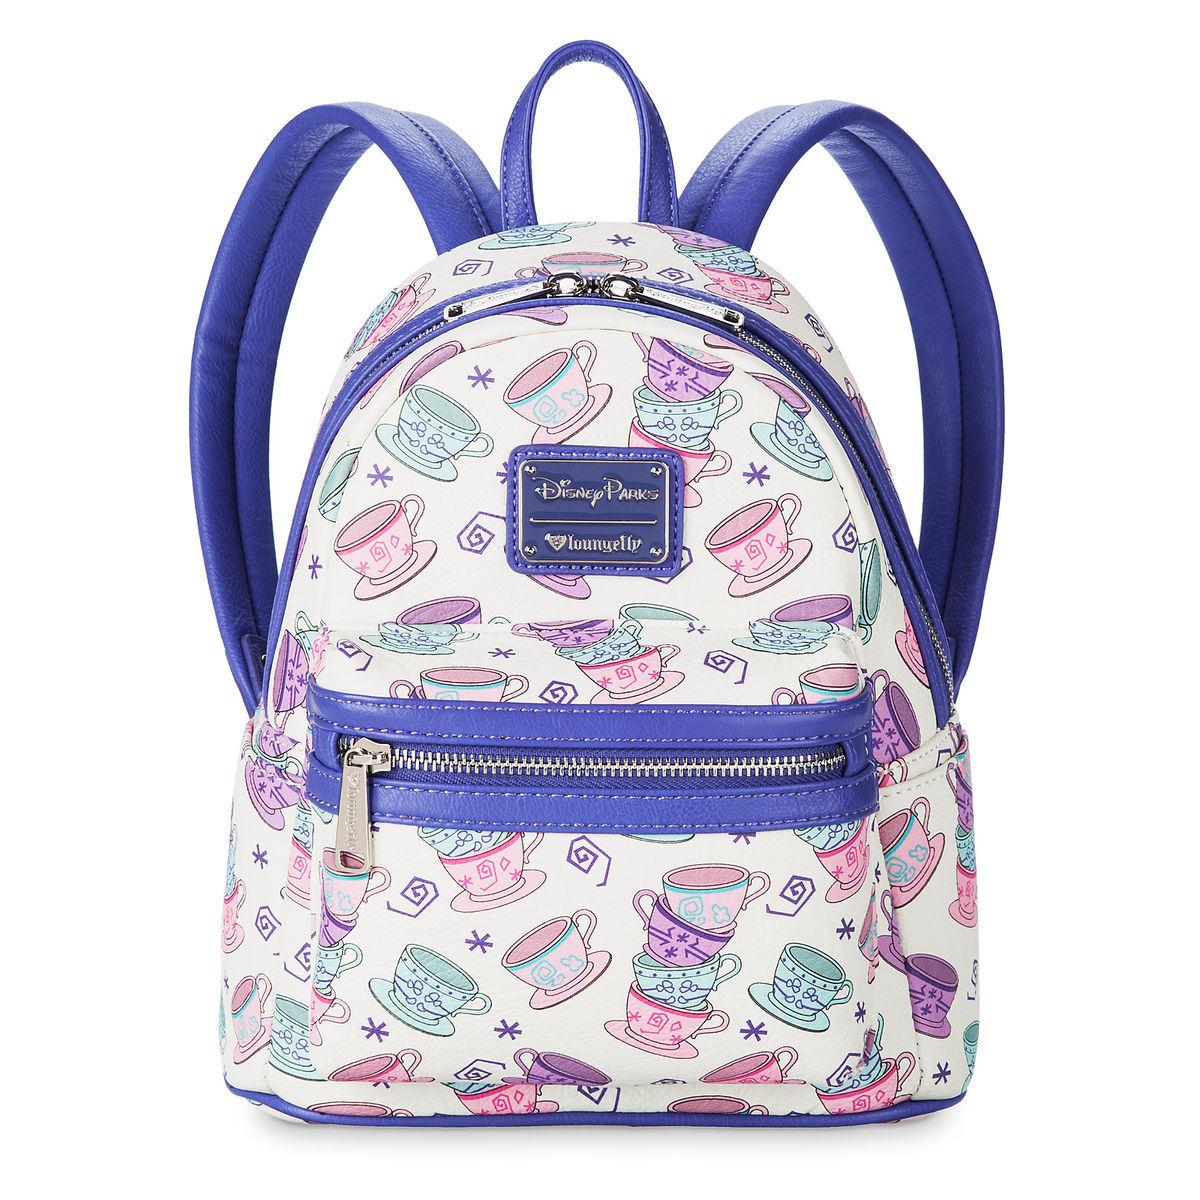 7b30aa4e579 Disney Loungefly Backpack - Mad Tea Party - Tea Cups - Mini